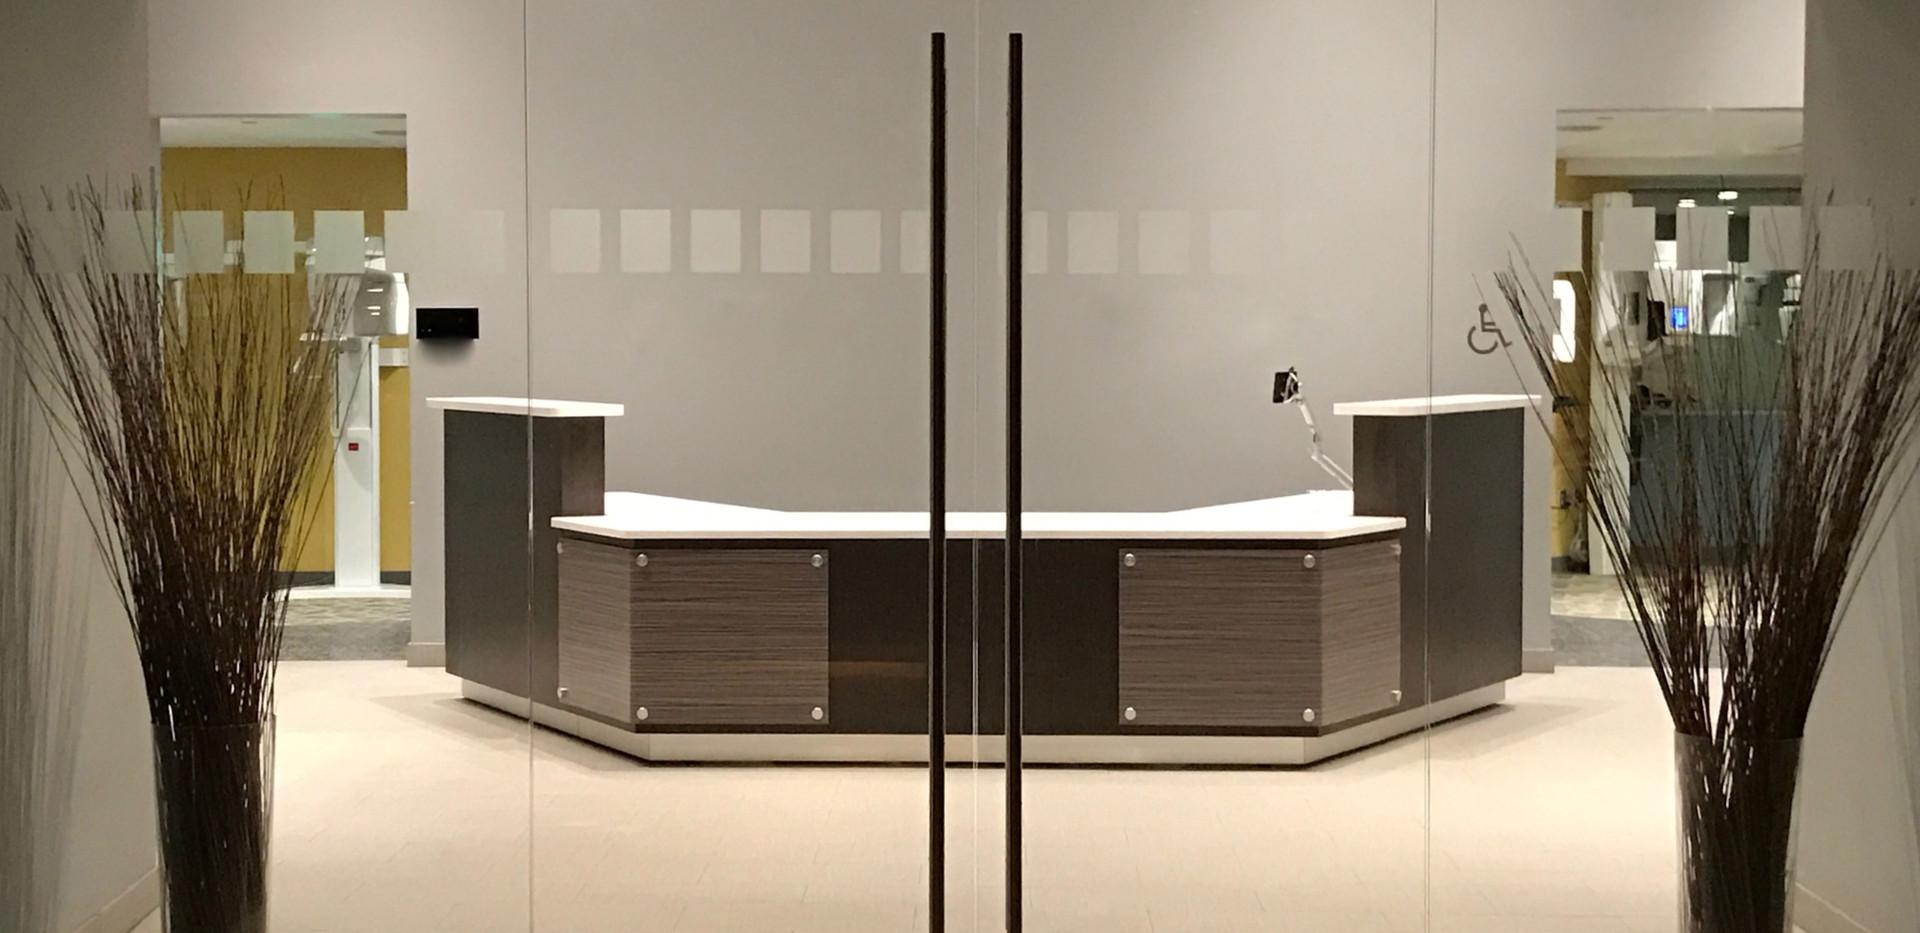 reception_desk%20edited_edited.jpg